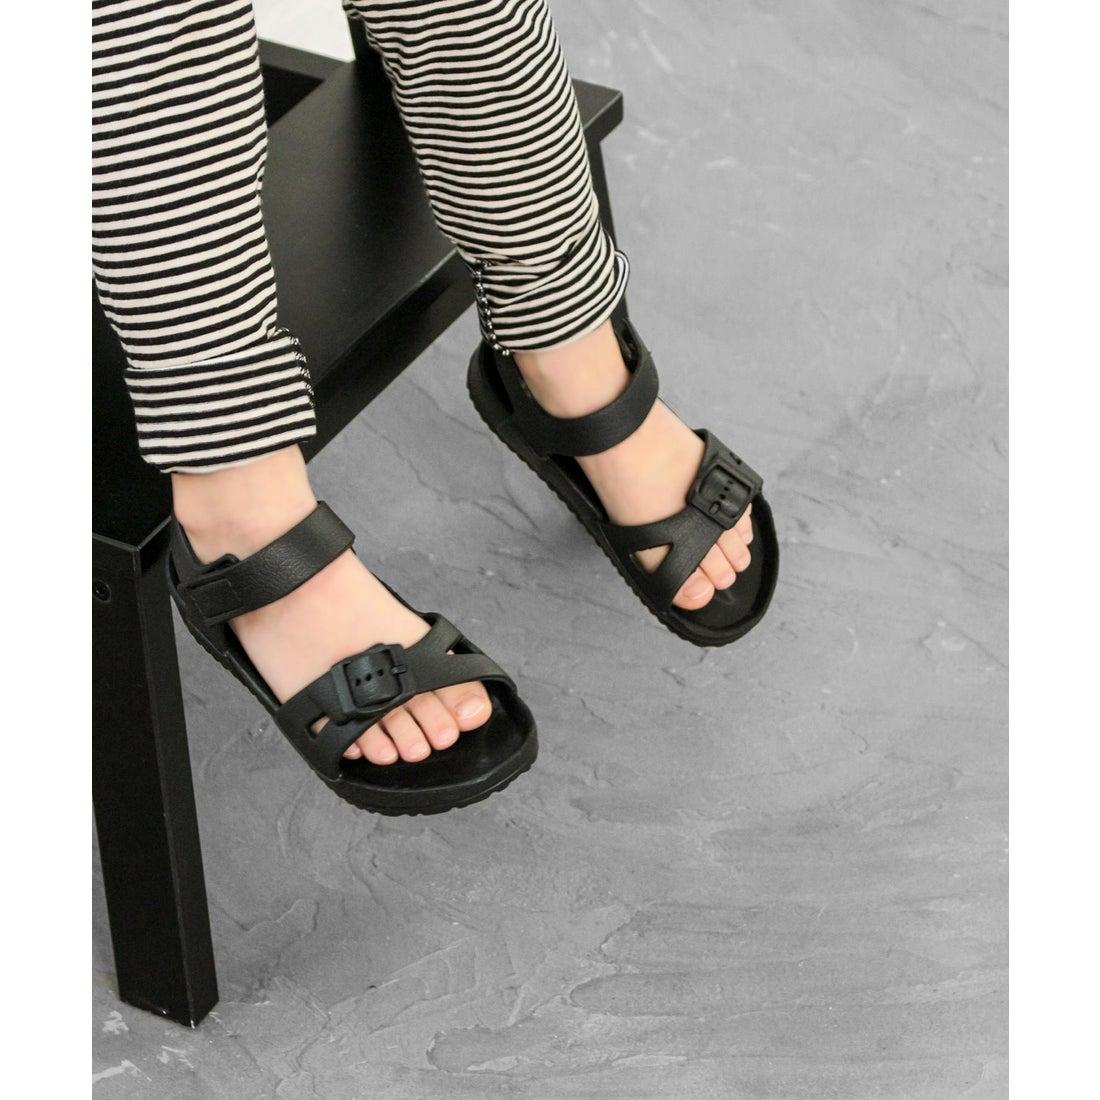 382af48989b15 キッズ ソロット SOROTTO EVAアンクルストラップサンダル ソロット SOROTTO (KIDS) (BLACK) -靴&ファッション通販  ロコンド〜自宅で試着、気軽に返品